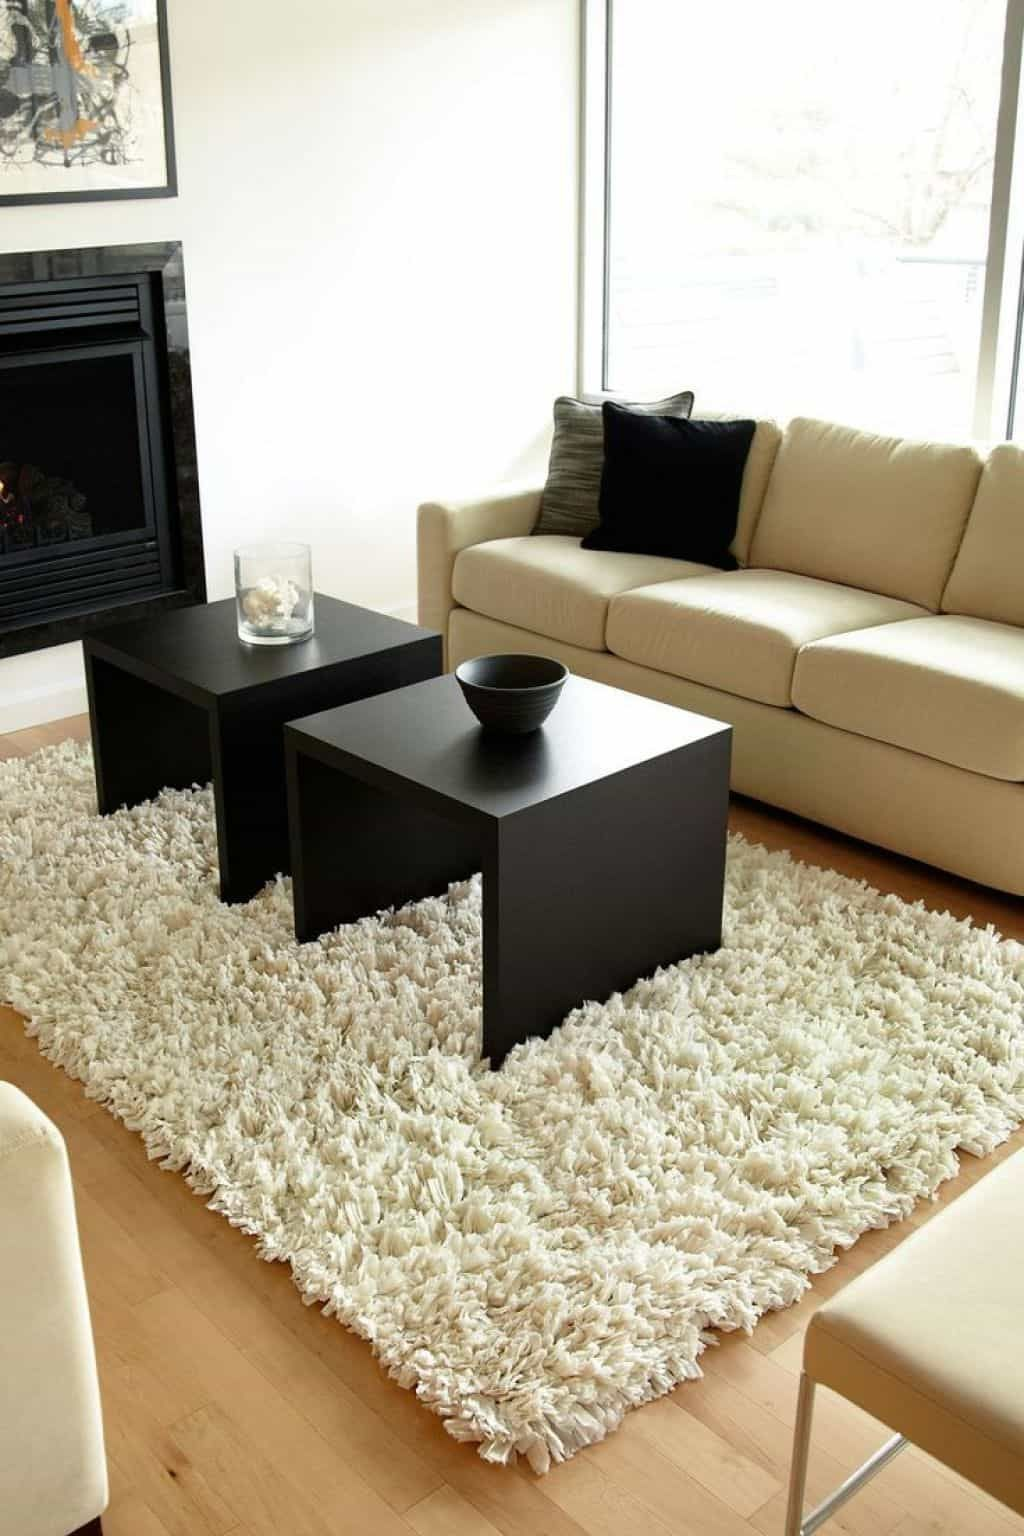 Cleaning Your Shag Rugs Shag rug, Clean shag rug, White